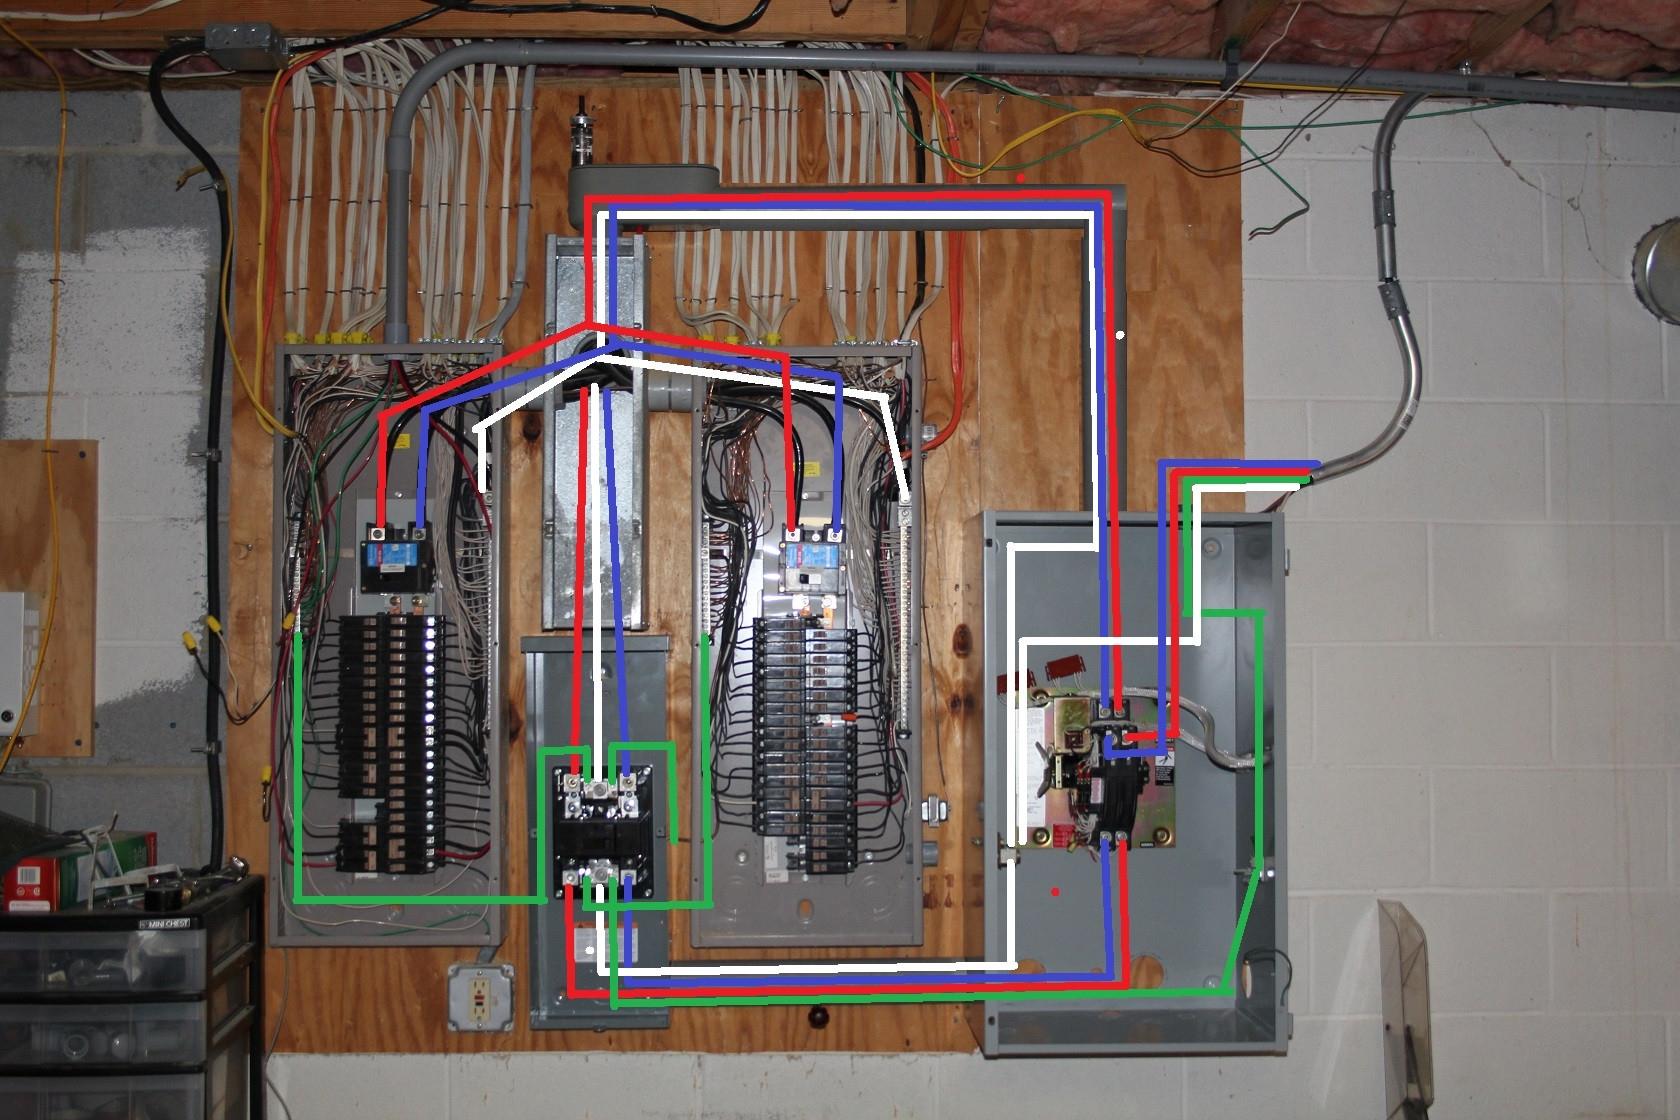 hight resolution of  generac generac rv generator plug wiring diagram schematic diagram on generac rv generators troubleshooting